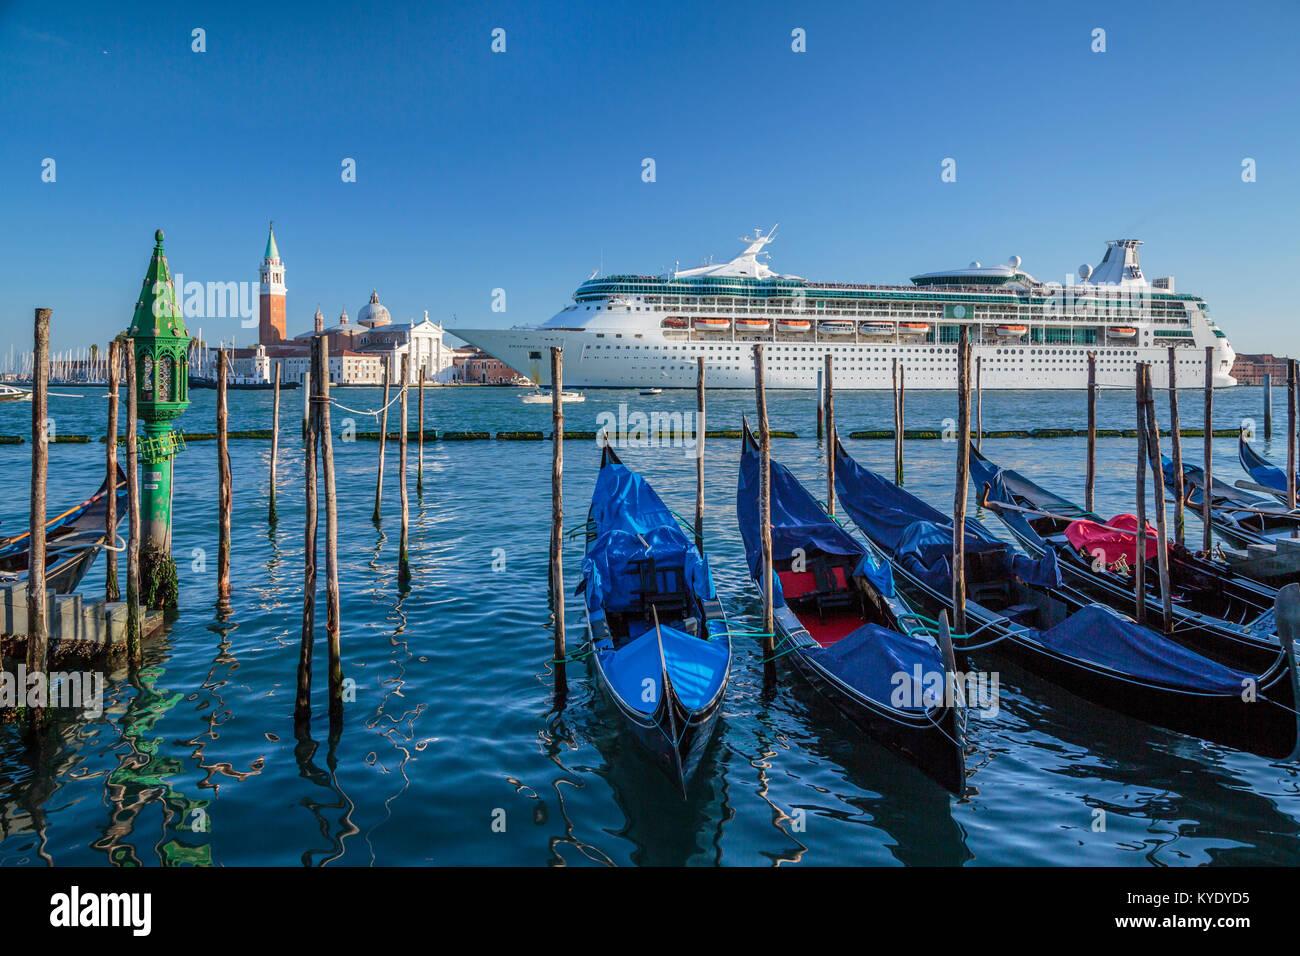 The Royal Caribbean cruise ship Rhapsody of the Seas and gondolas in Veneto, Venice, Italy, Europe. - Stock Image